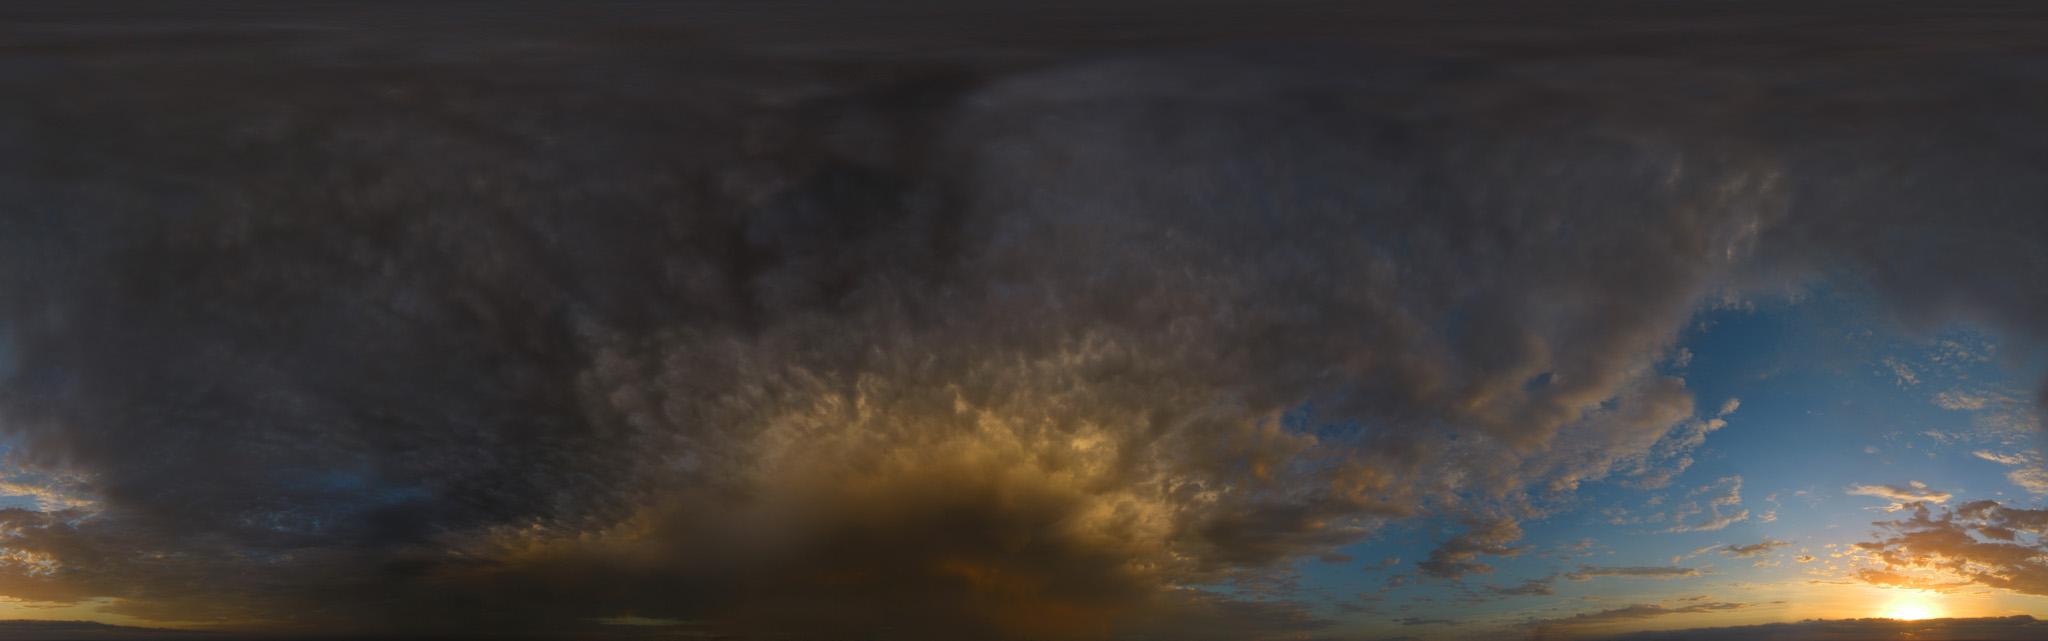 free sky textures hyperfocal